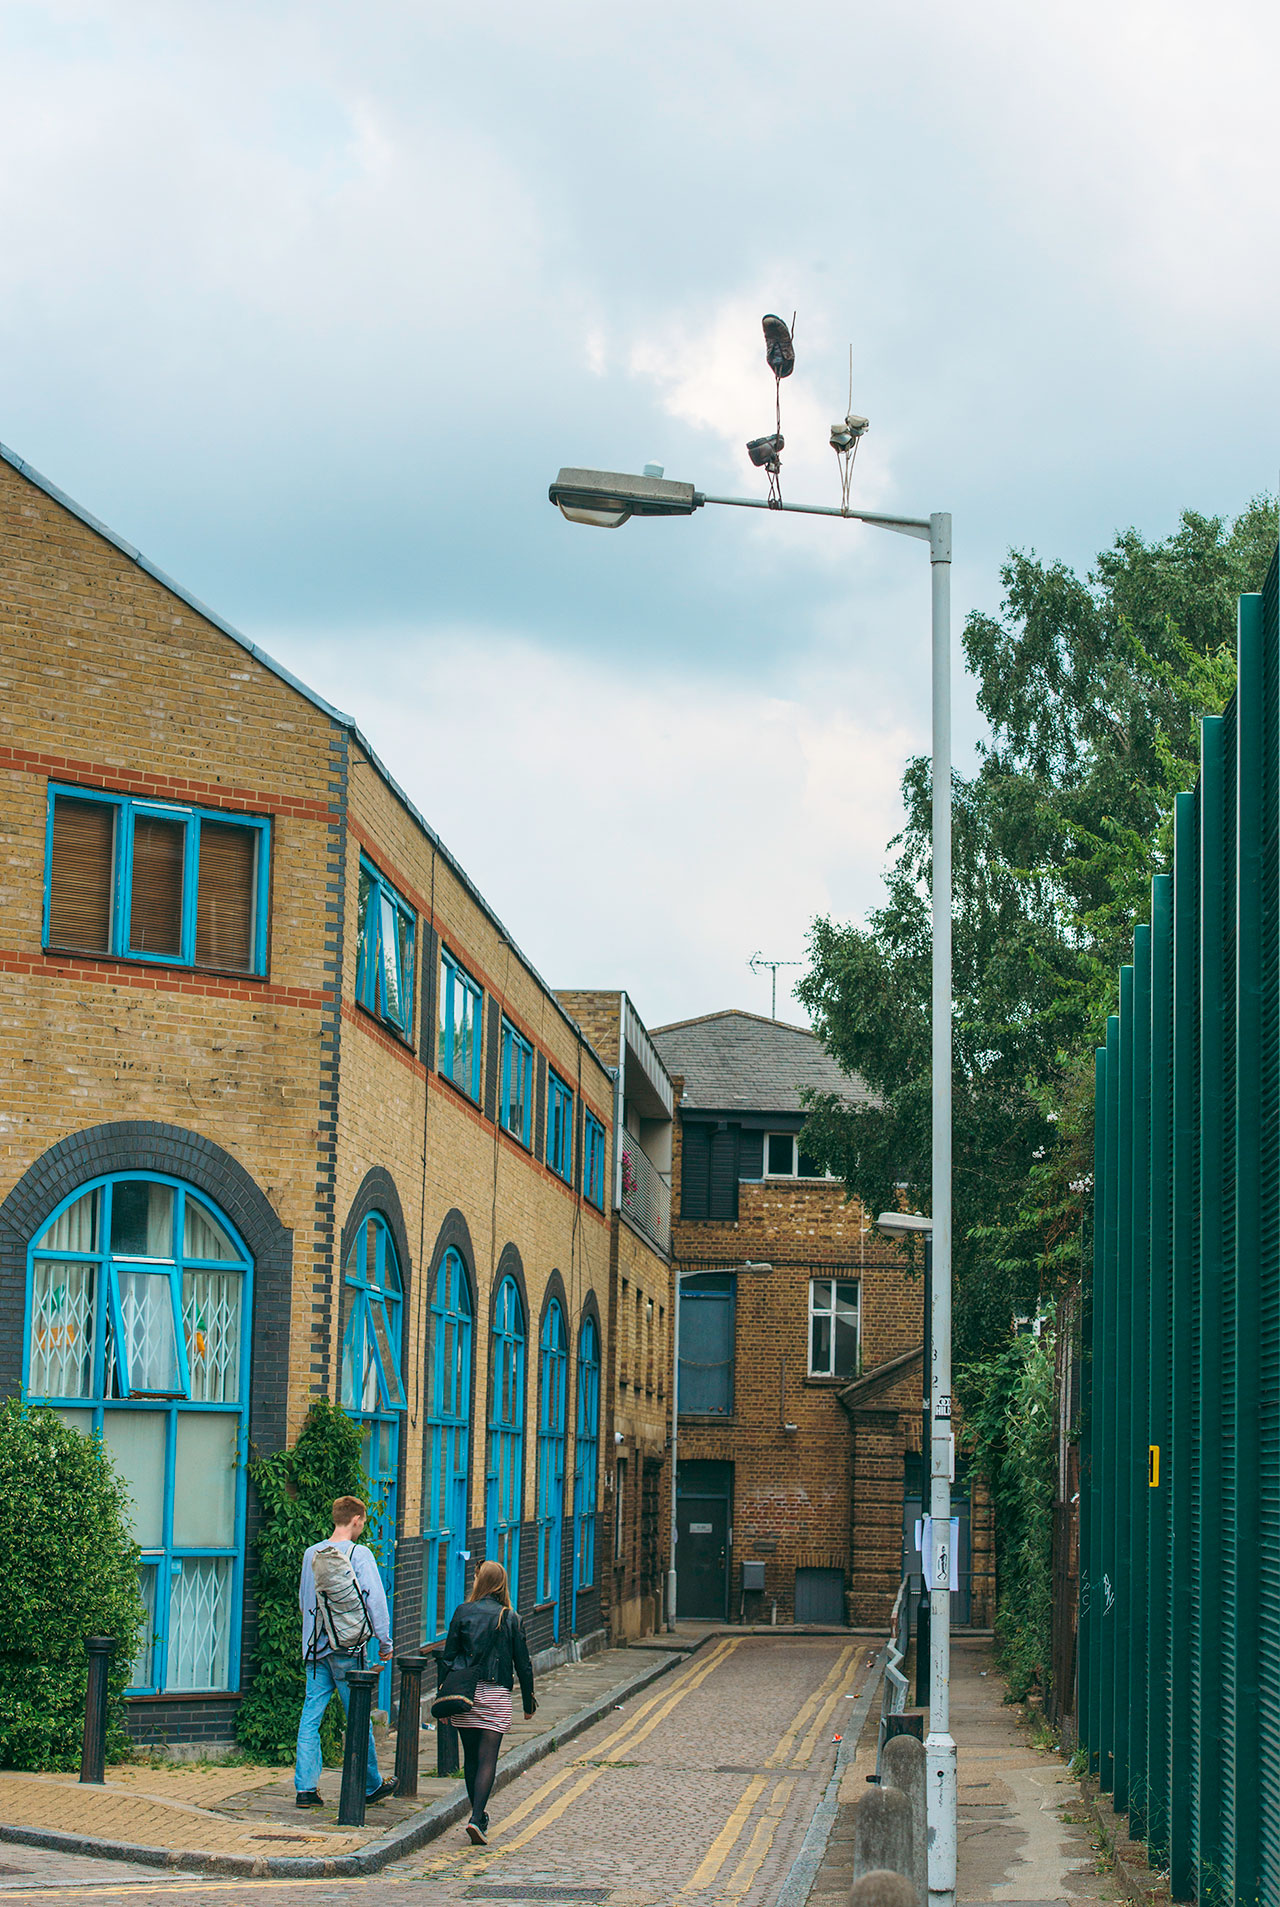 Pejac,Downside Up #1,East London,United Kingdom,2016. Photo by Gary Van Handley.